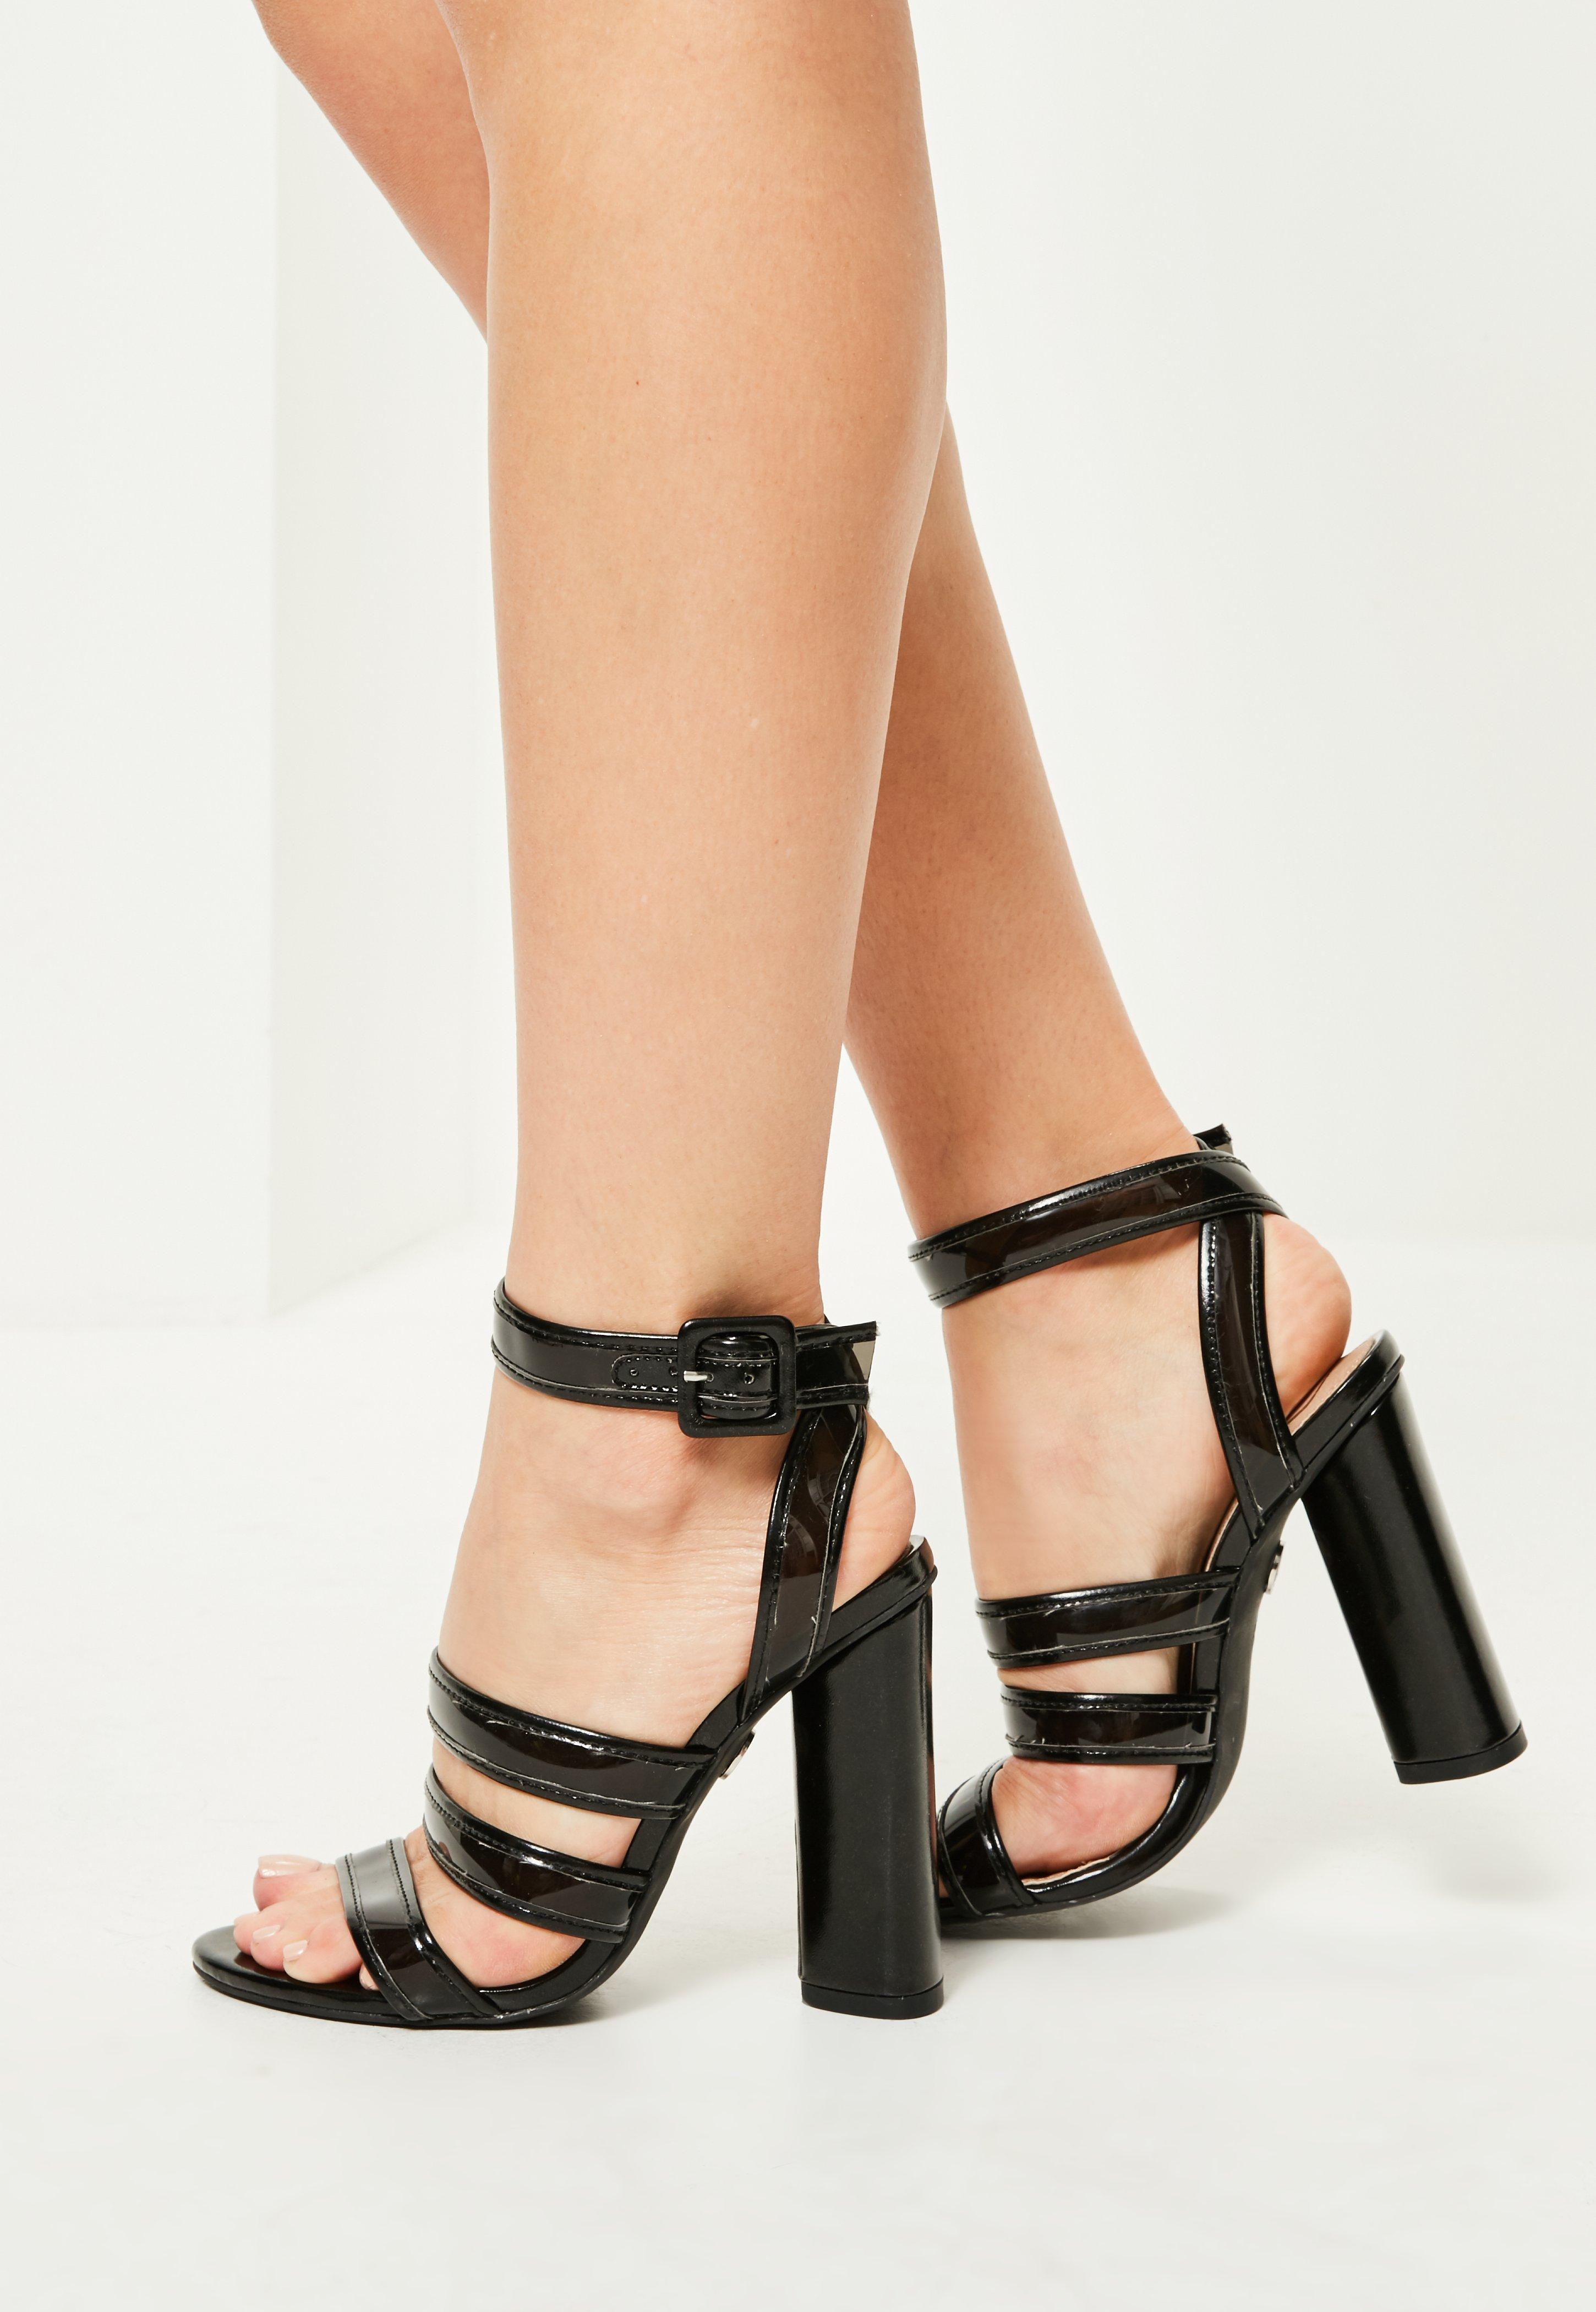 08759d6c2d3 Lyst - Missguided Black Multi Strap Block Heeled Sandals in Black